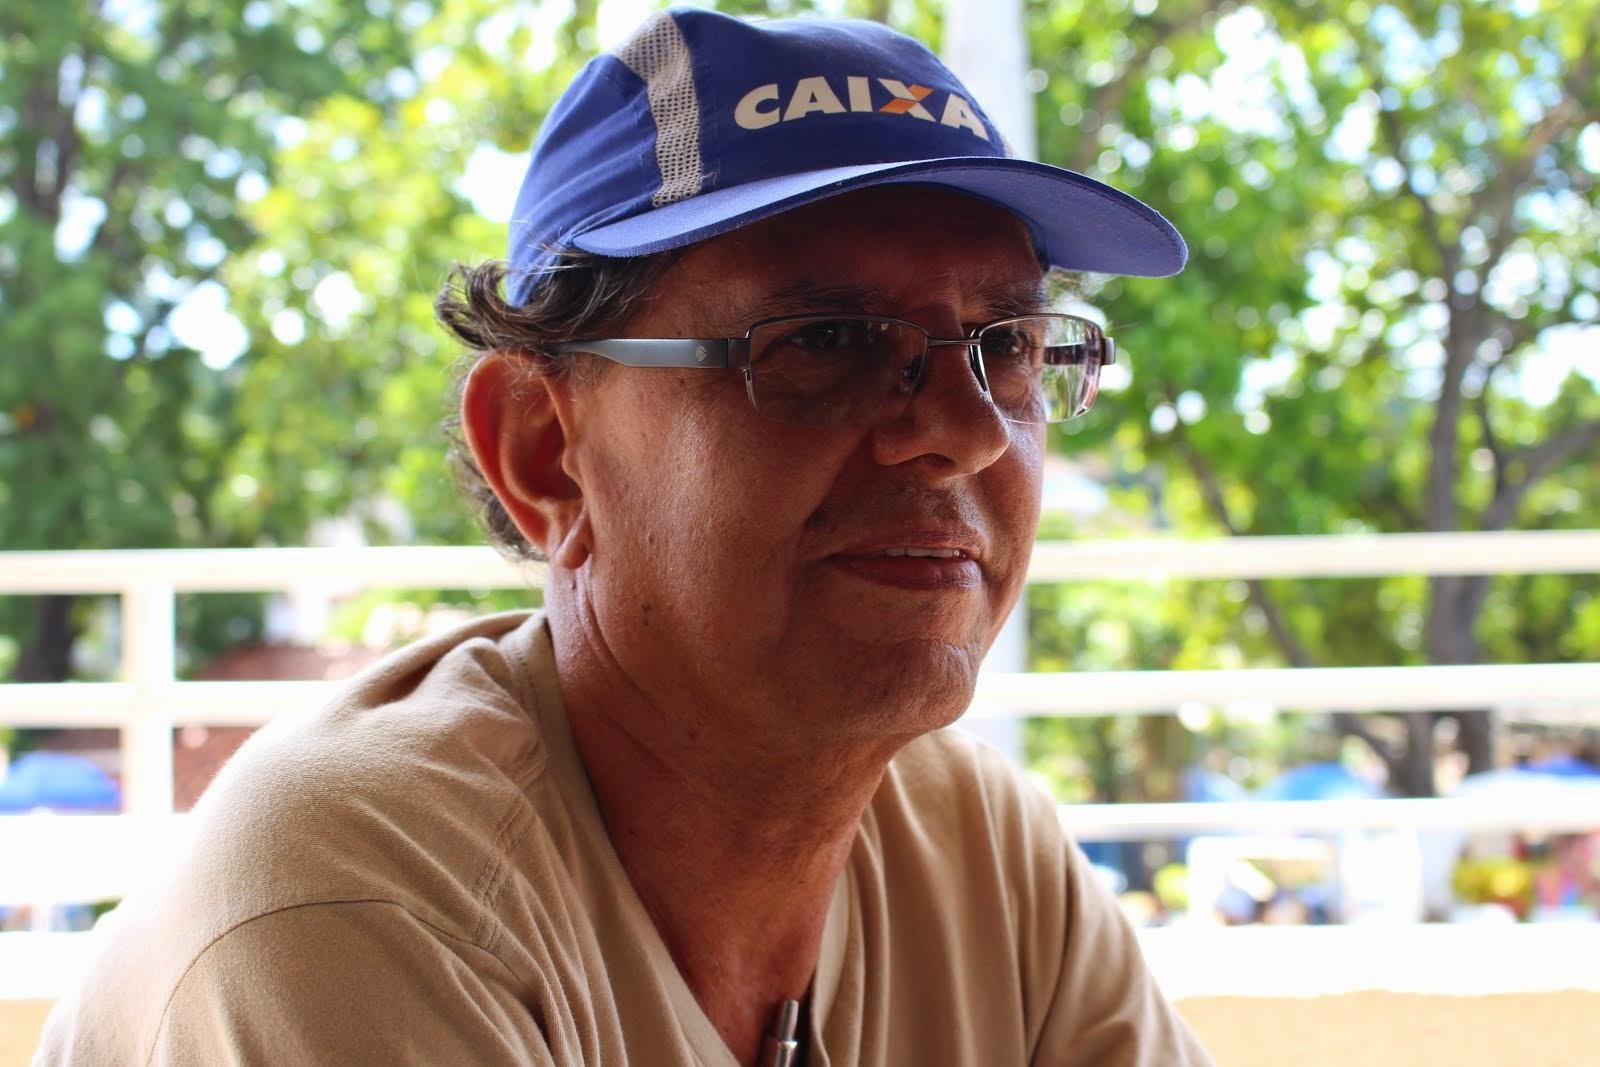 Cleuber Marques da Silva